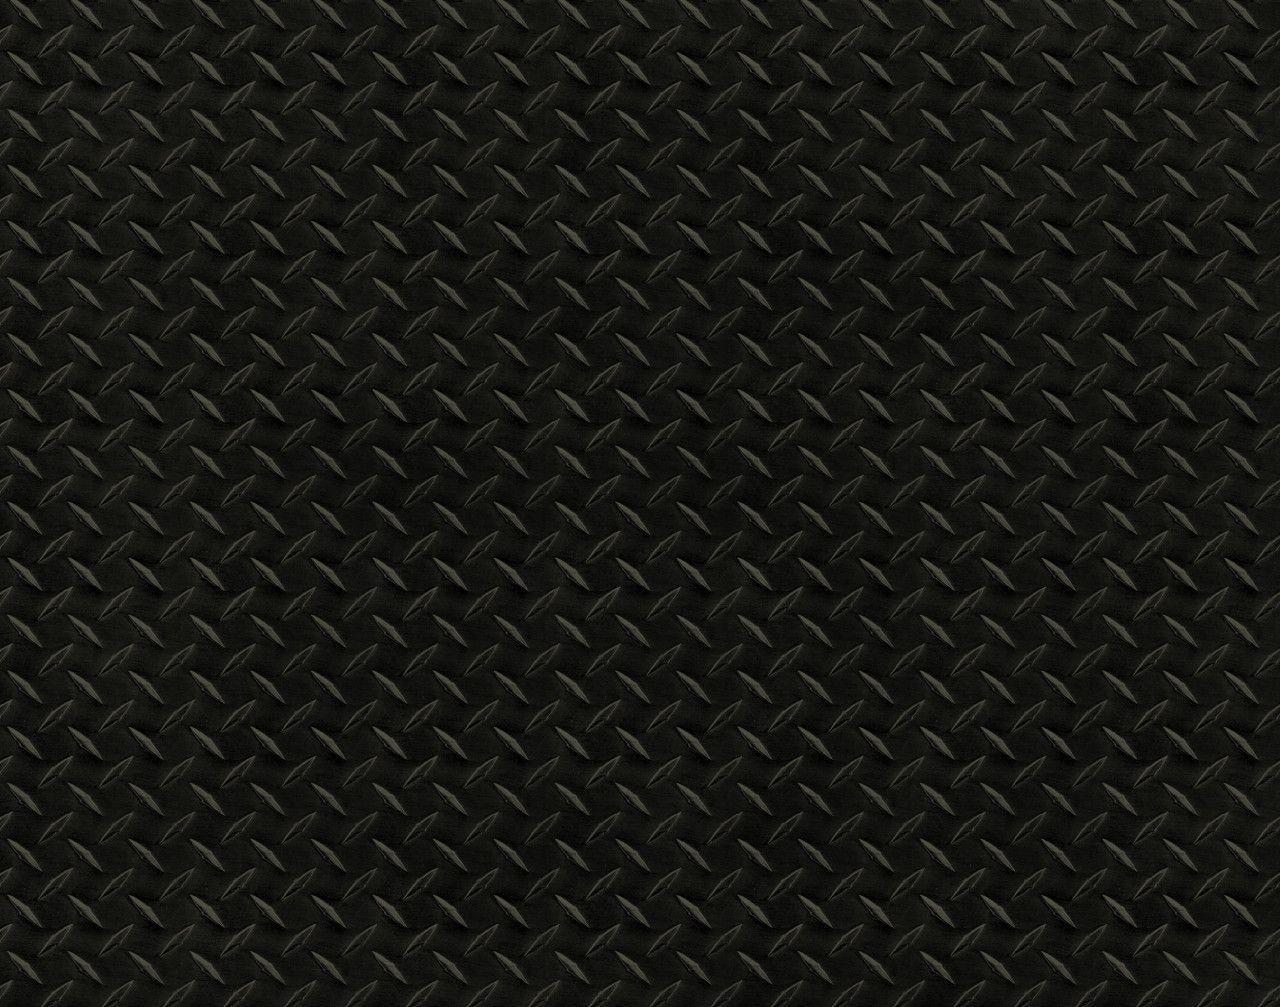 Black Diamond Plate Wallpaper Black Steel Backgrounds Wallpaper Cave